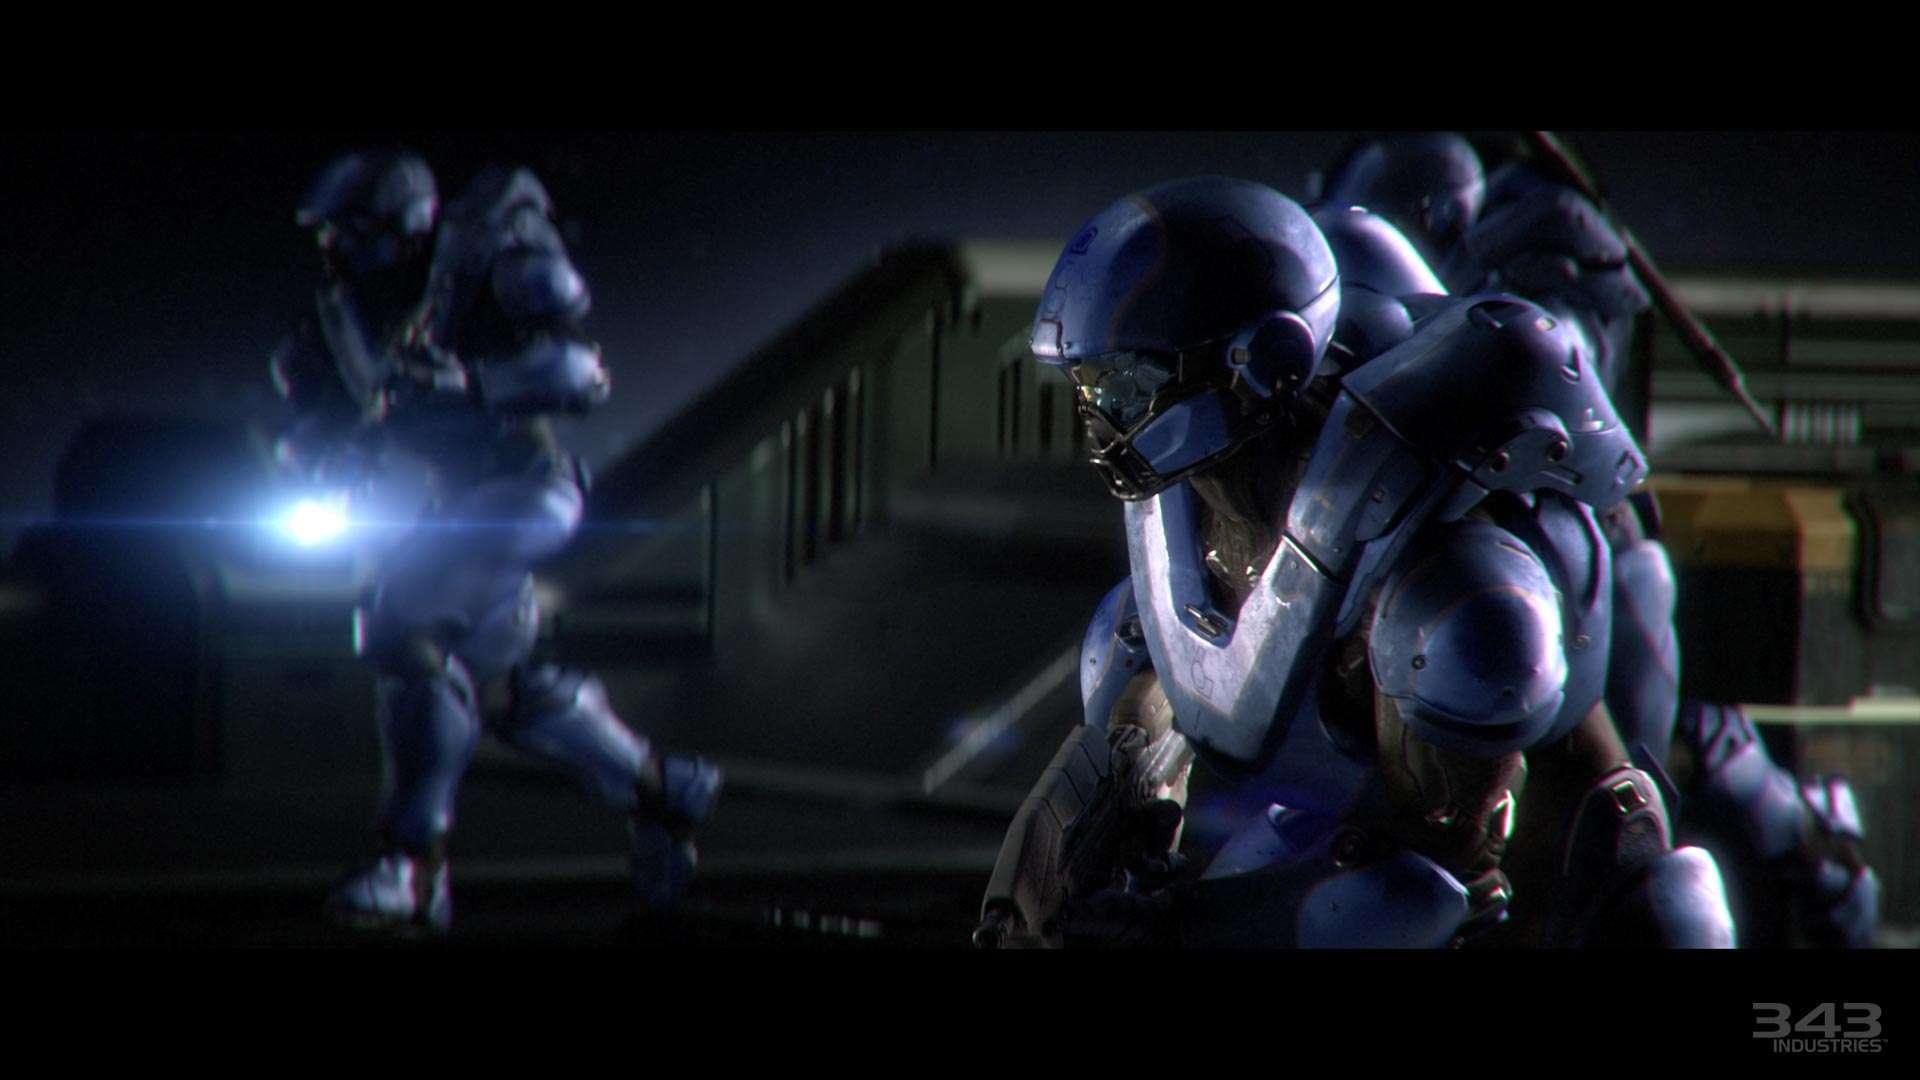 Wallpaper Halo 5 Guardians 02 HD Wallpaper Upload at October 2 2014 1920x1080